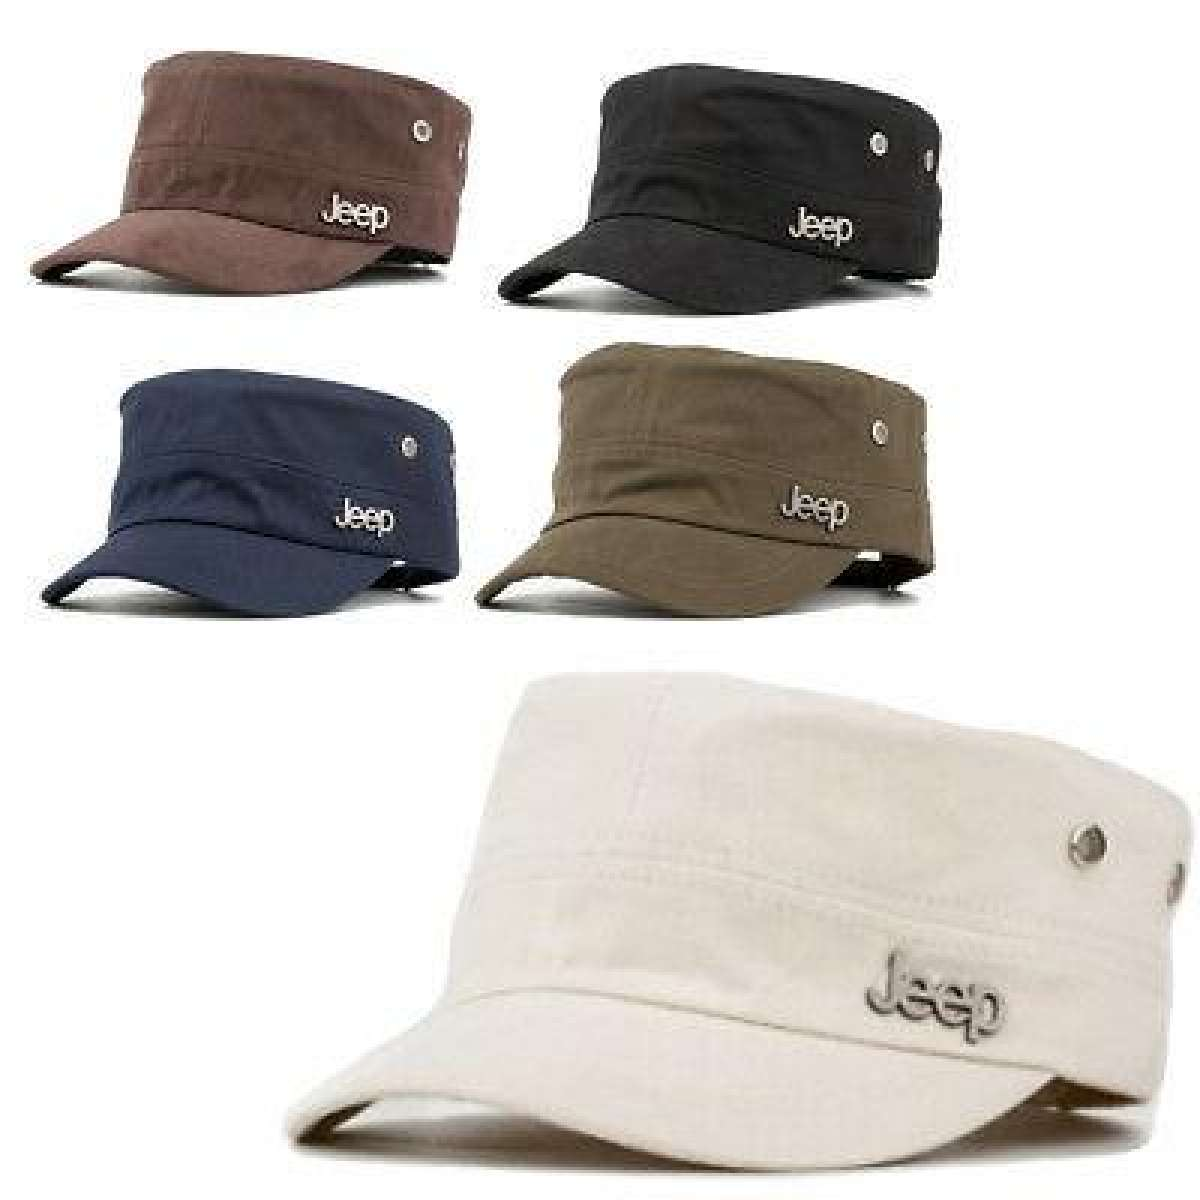 Unisex Sun Cap Mlticolor Military Style Flat Cap Sport Jeep Adjustable Hat Cool